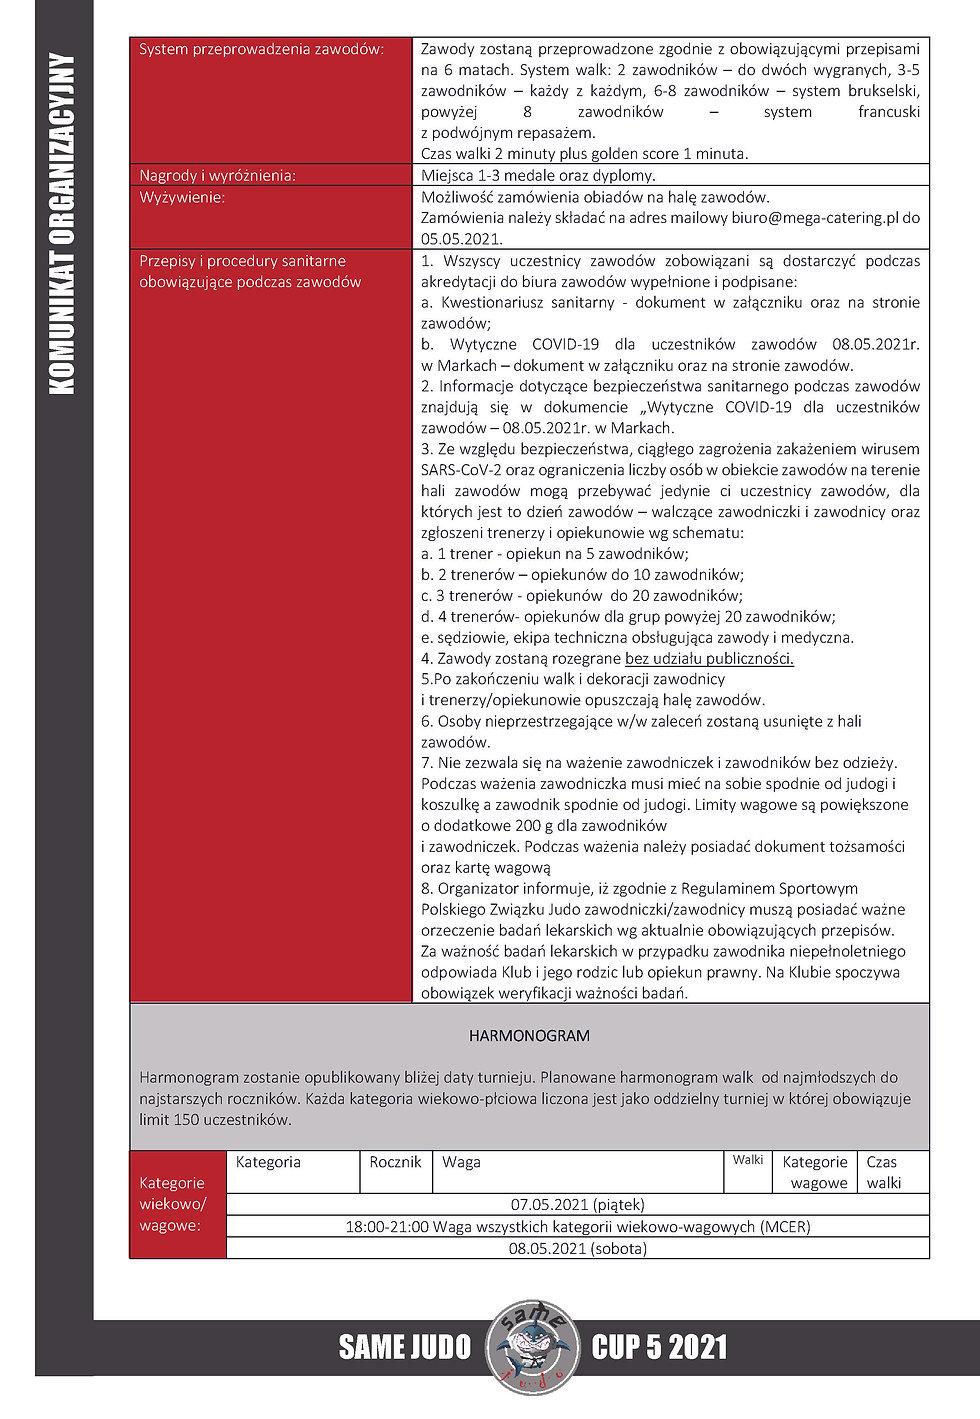 SJC 5 Komunikat - sobota str 2.jpg